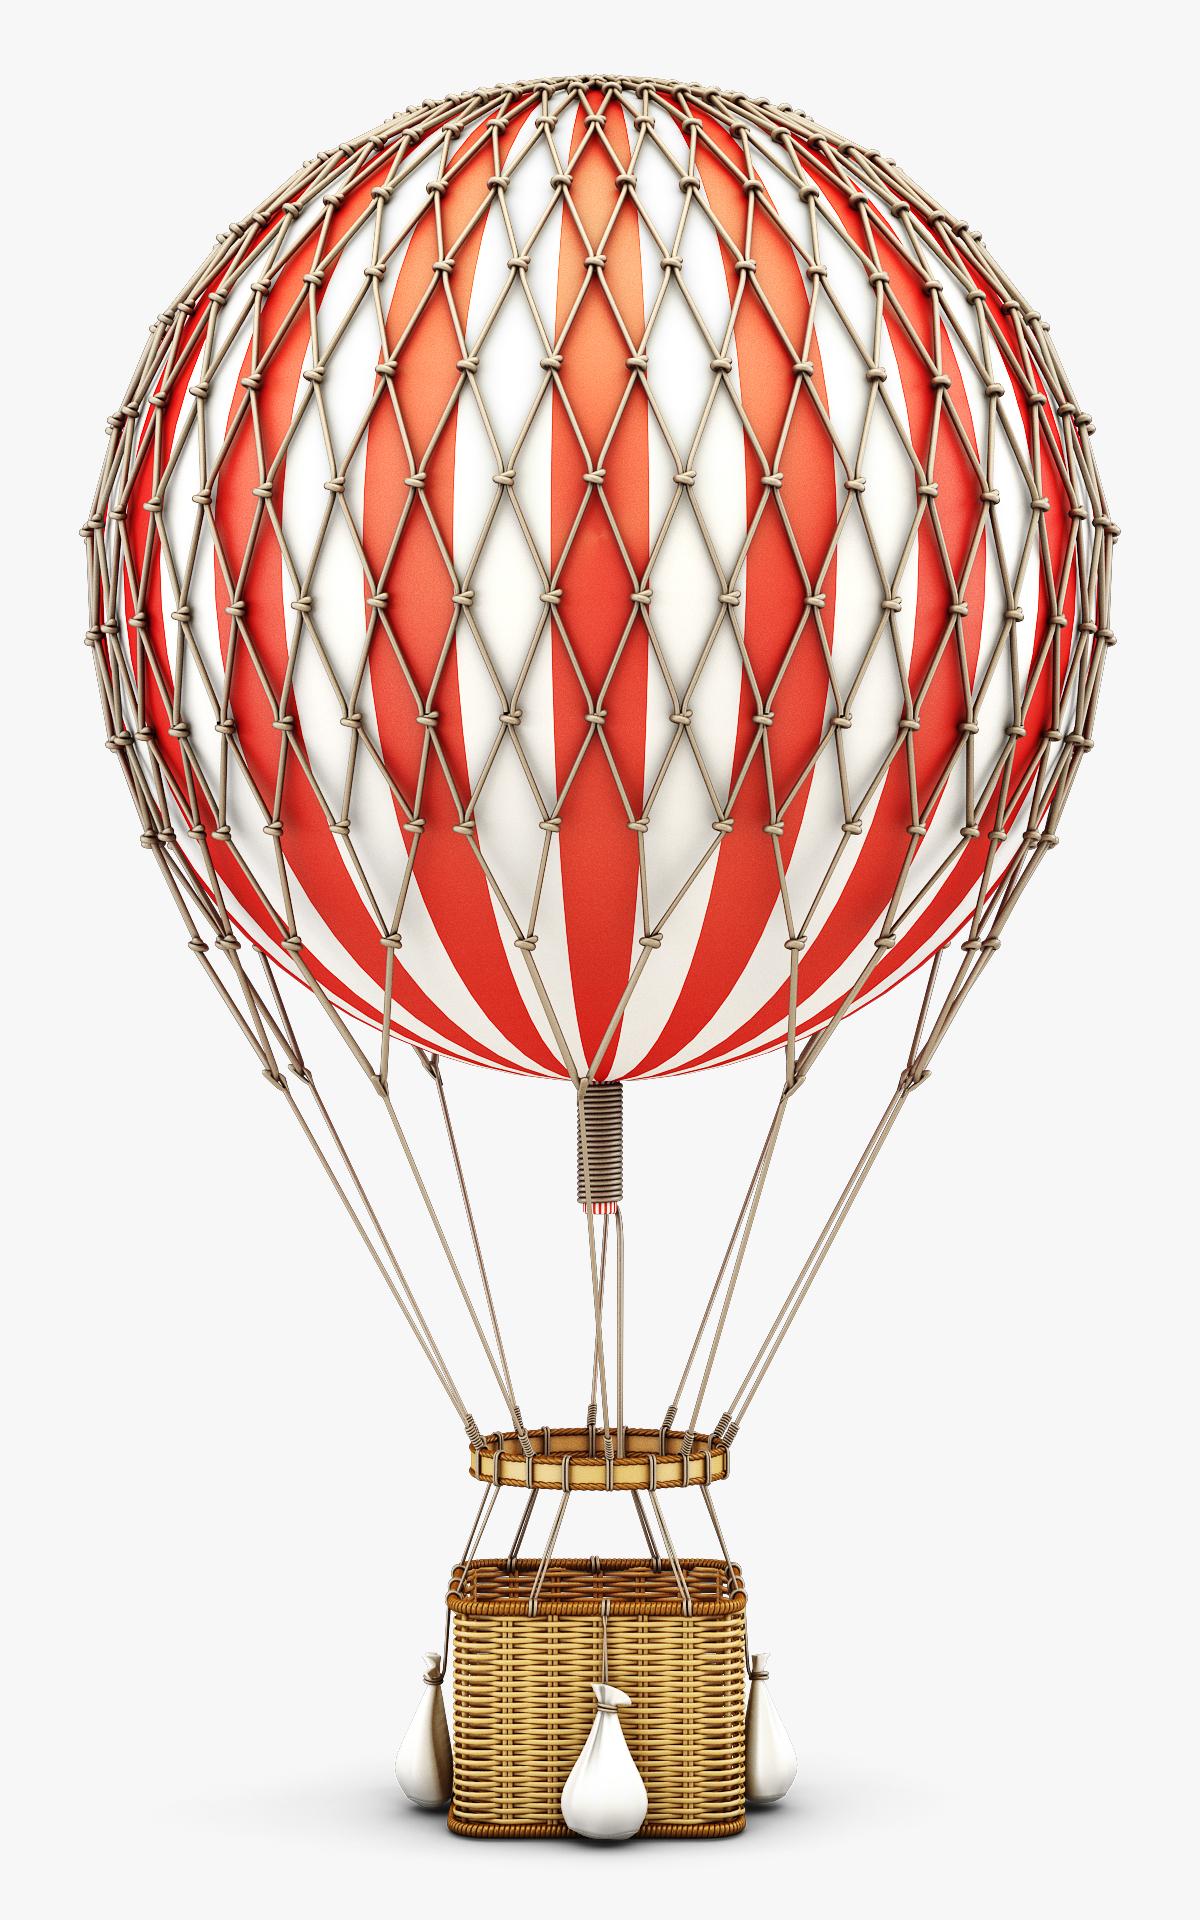 3D hot air balloon v model